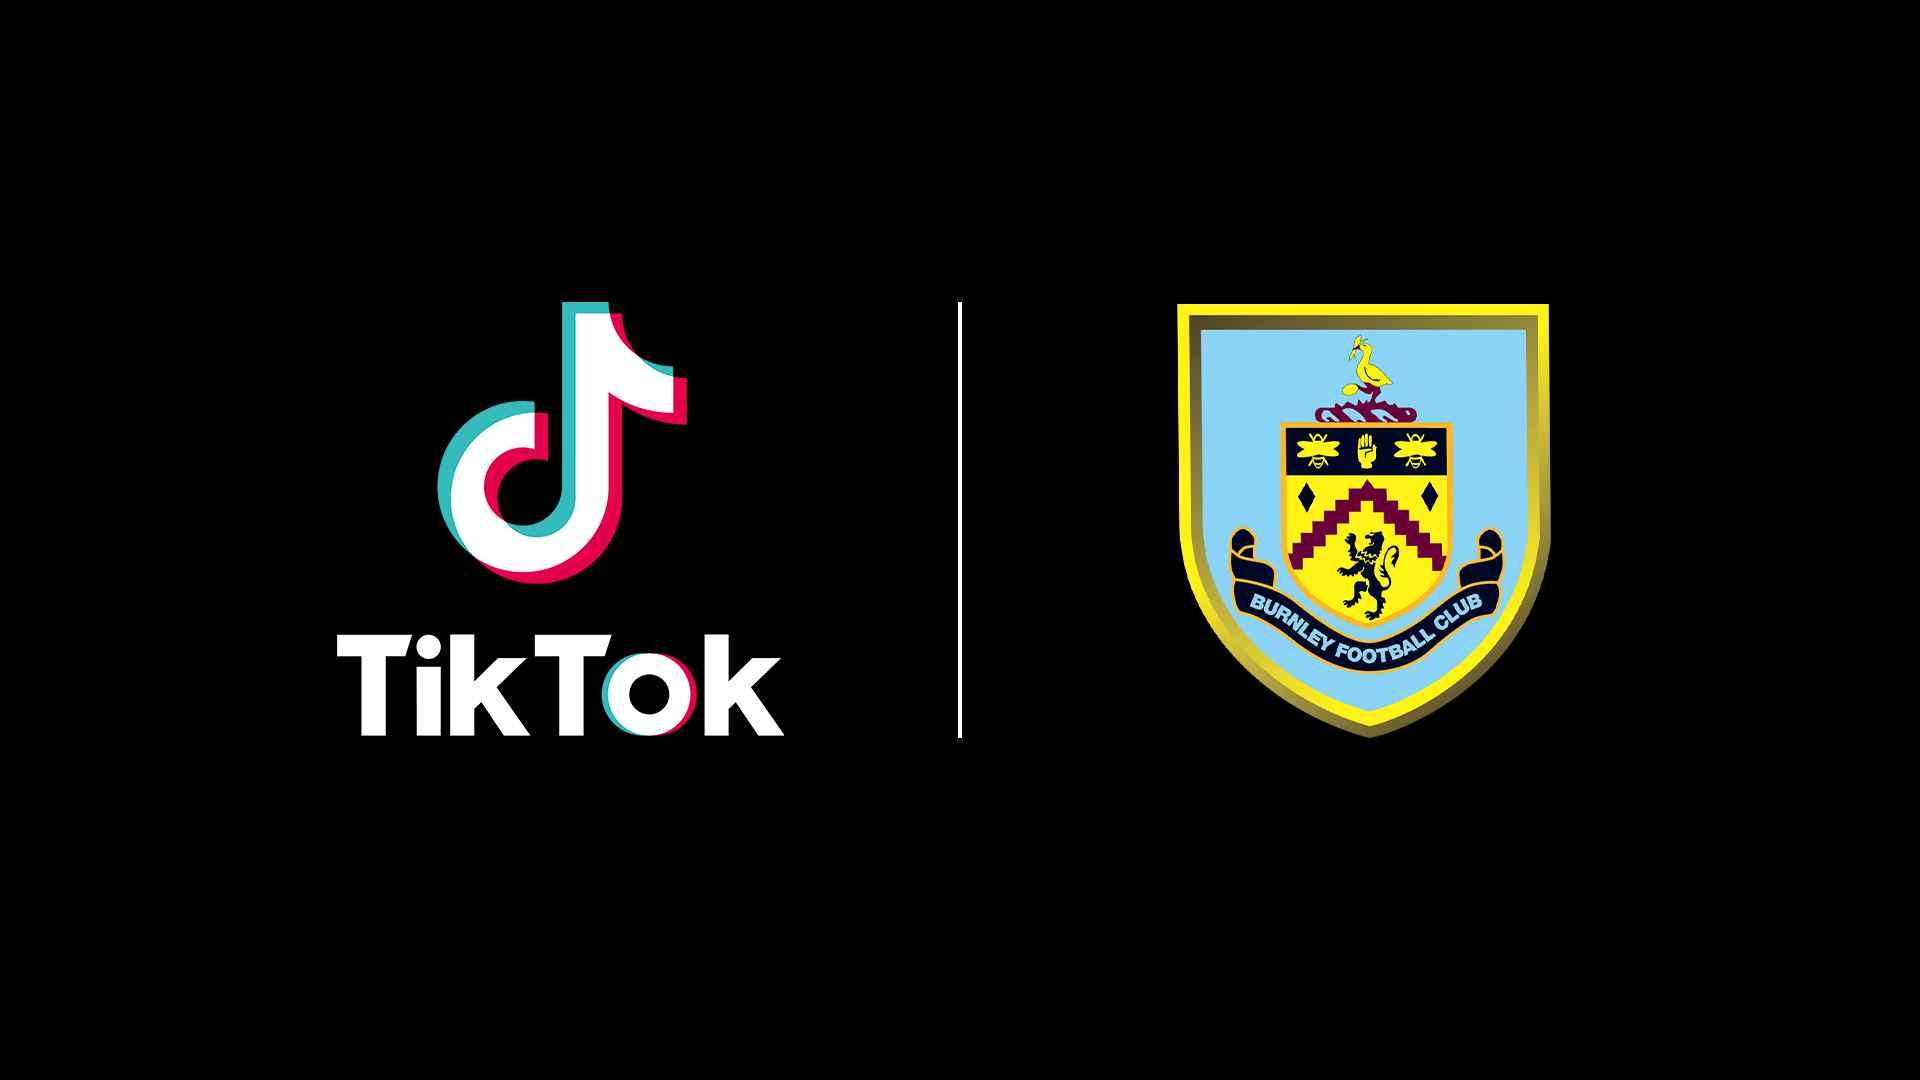 El equipo femenino inglés que será transmitido por TikTok